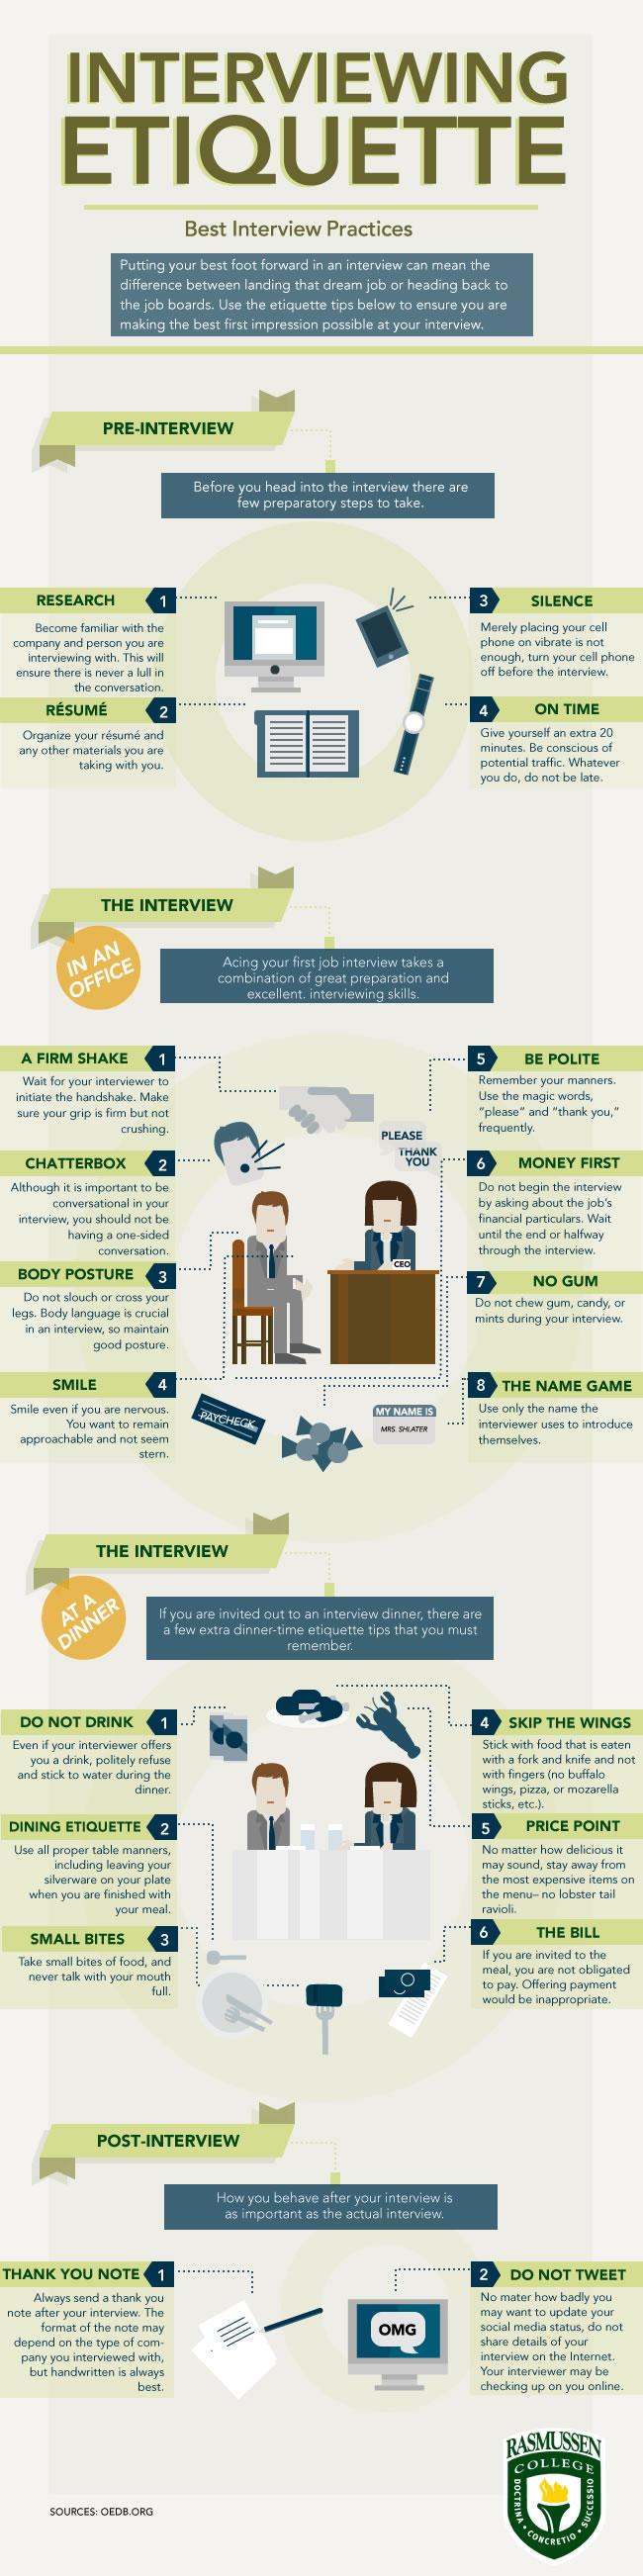 sollicitatie etiquette, voorbereiding, key, sollicitatie-etiquette